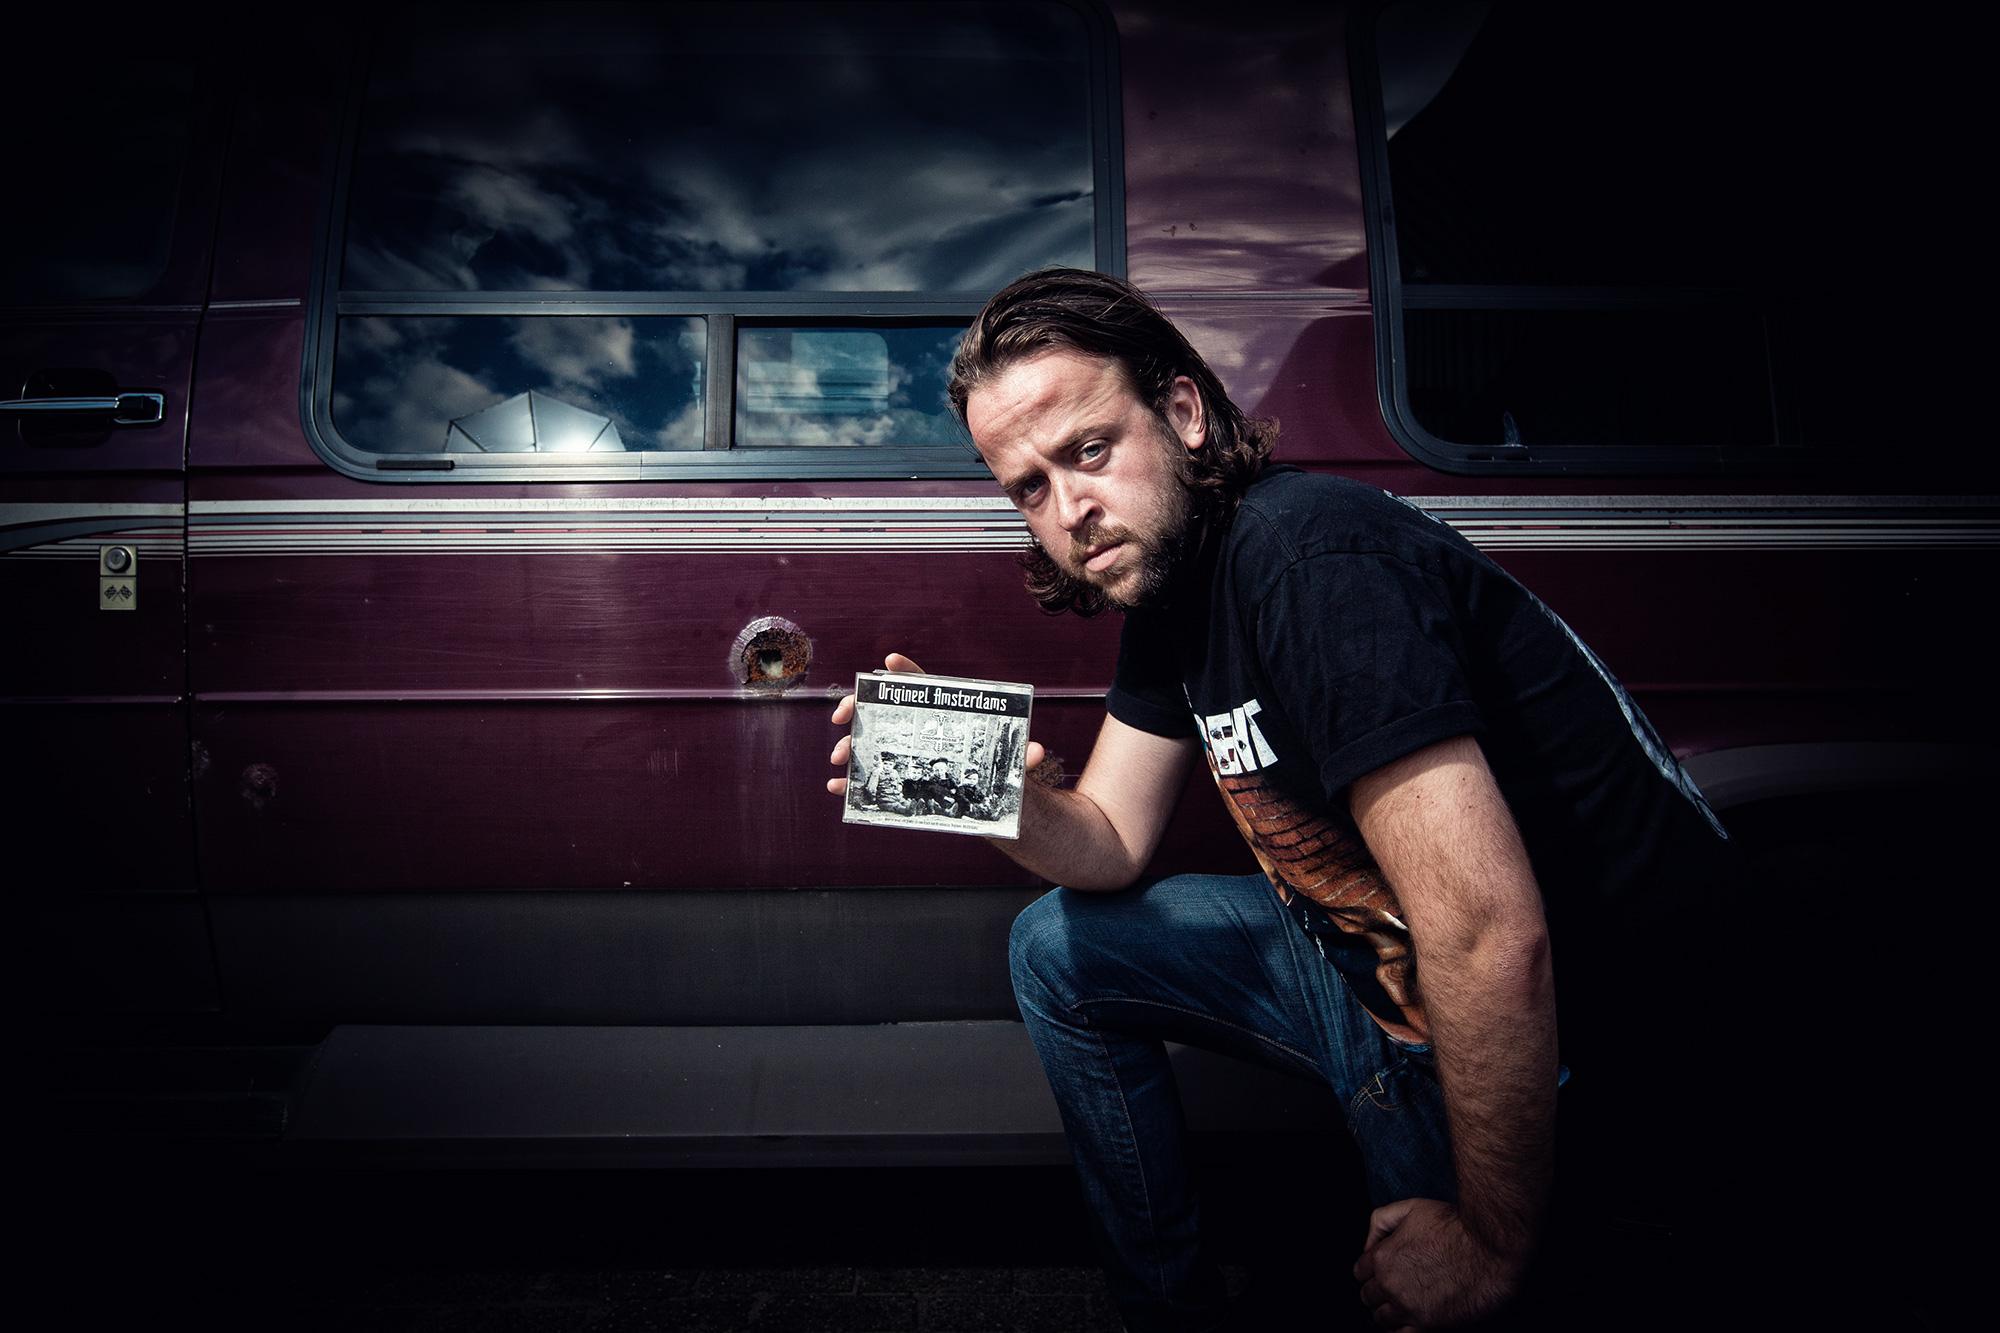 Portretfoto David van Unen - team Singlefeestje